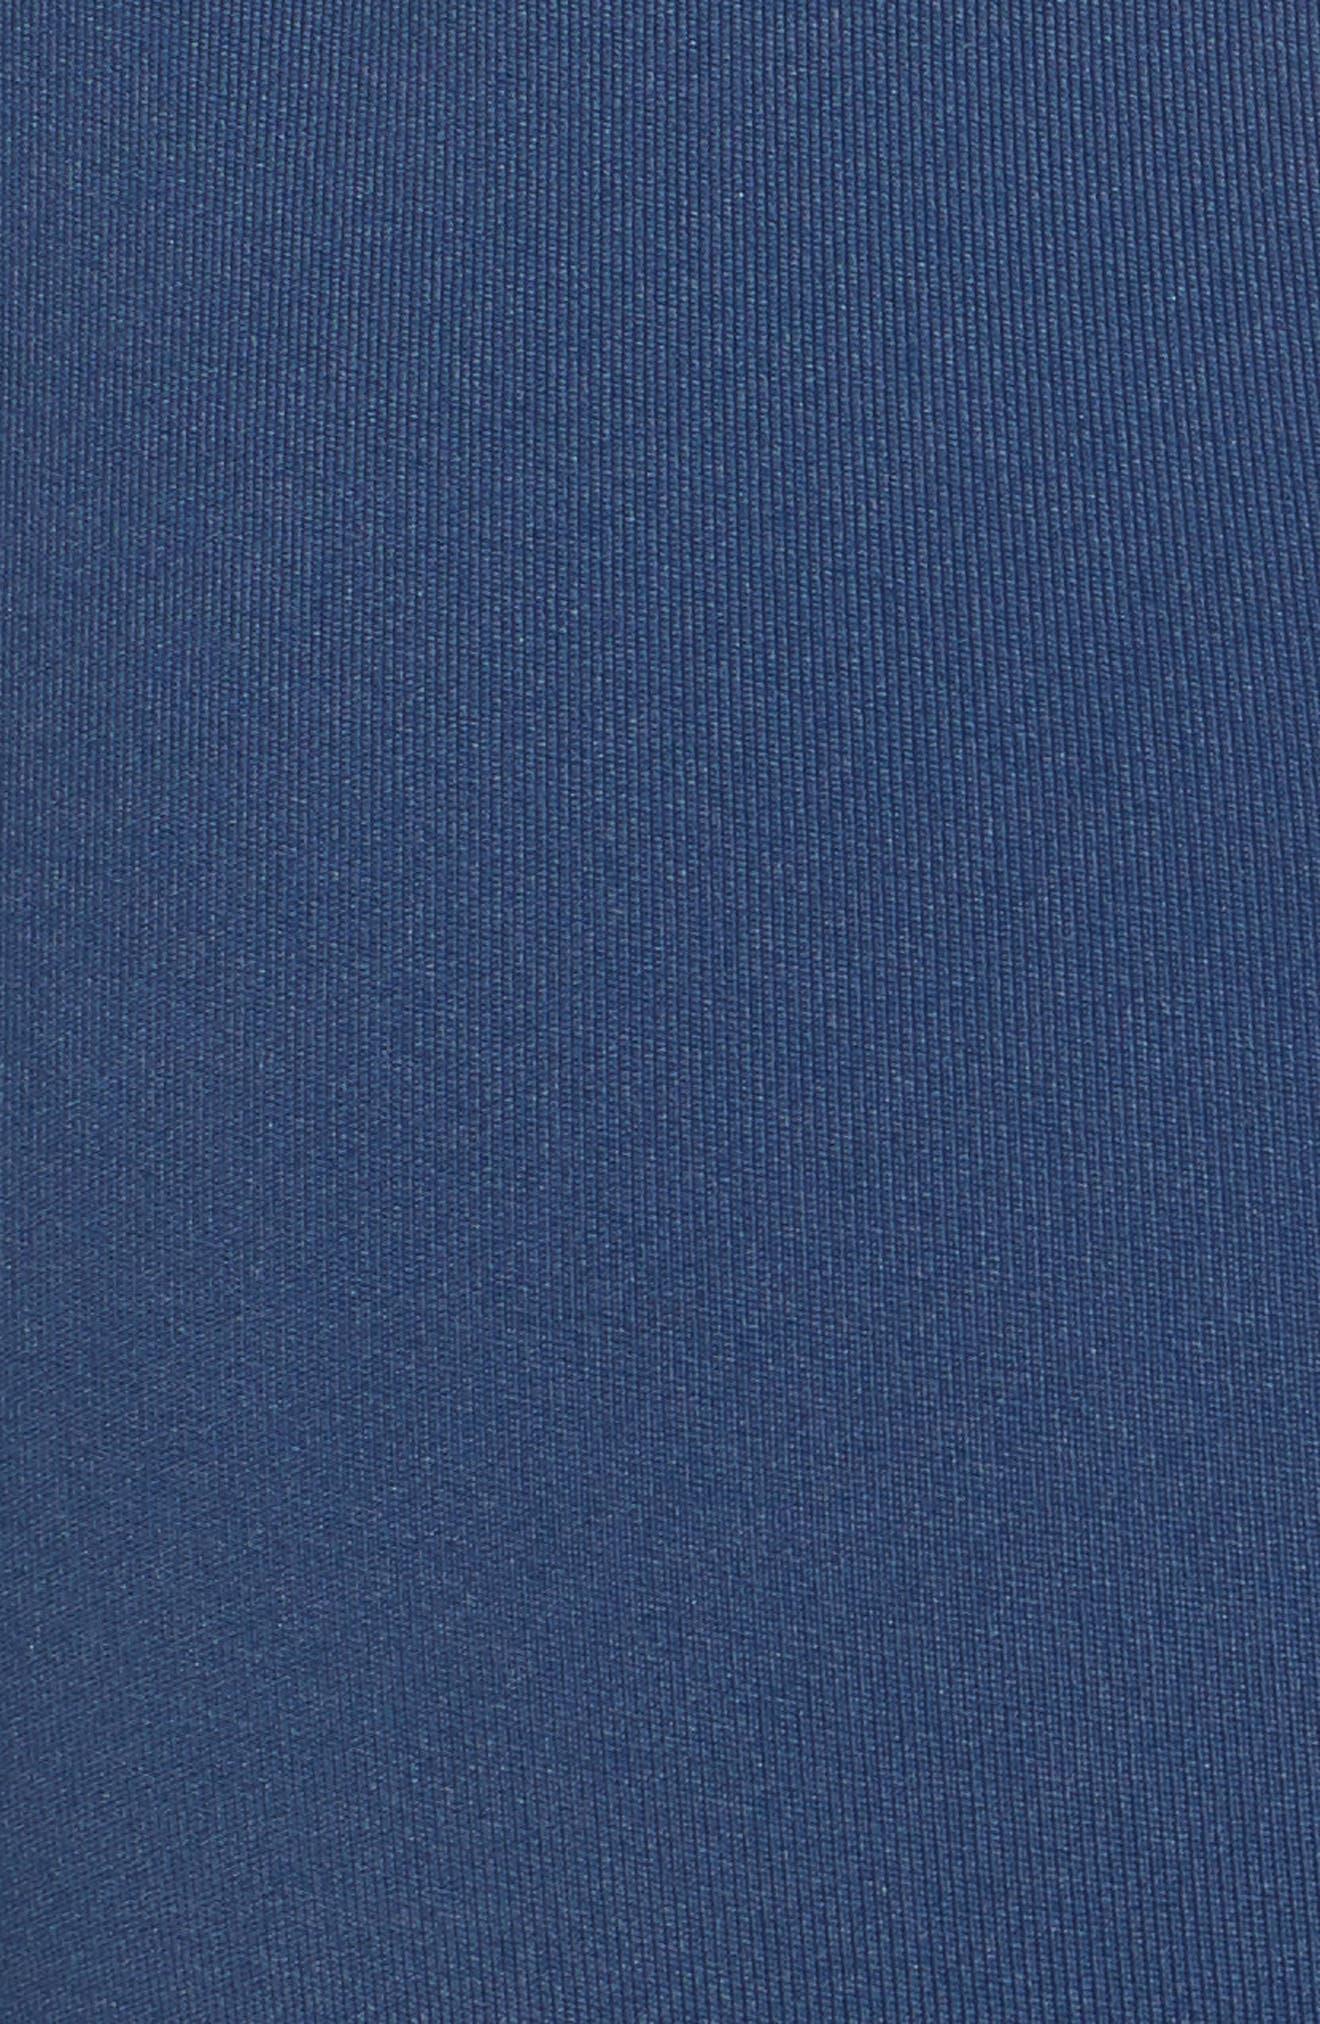 Marilyn Sports Bra,                             Alternate thumbnail 5, color,                             Blue Insignia